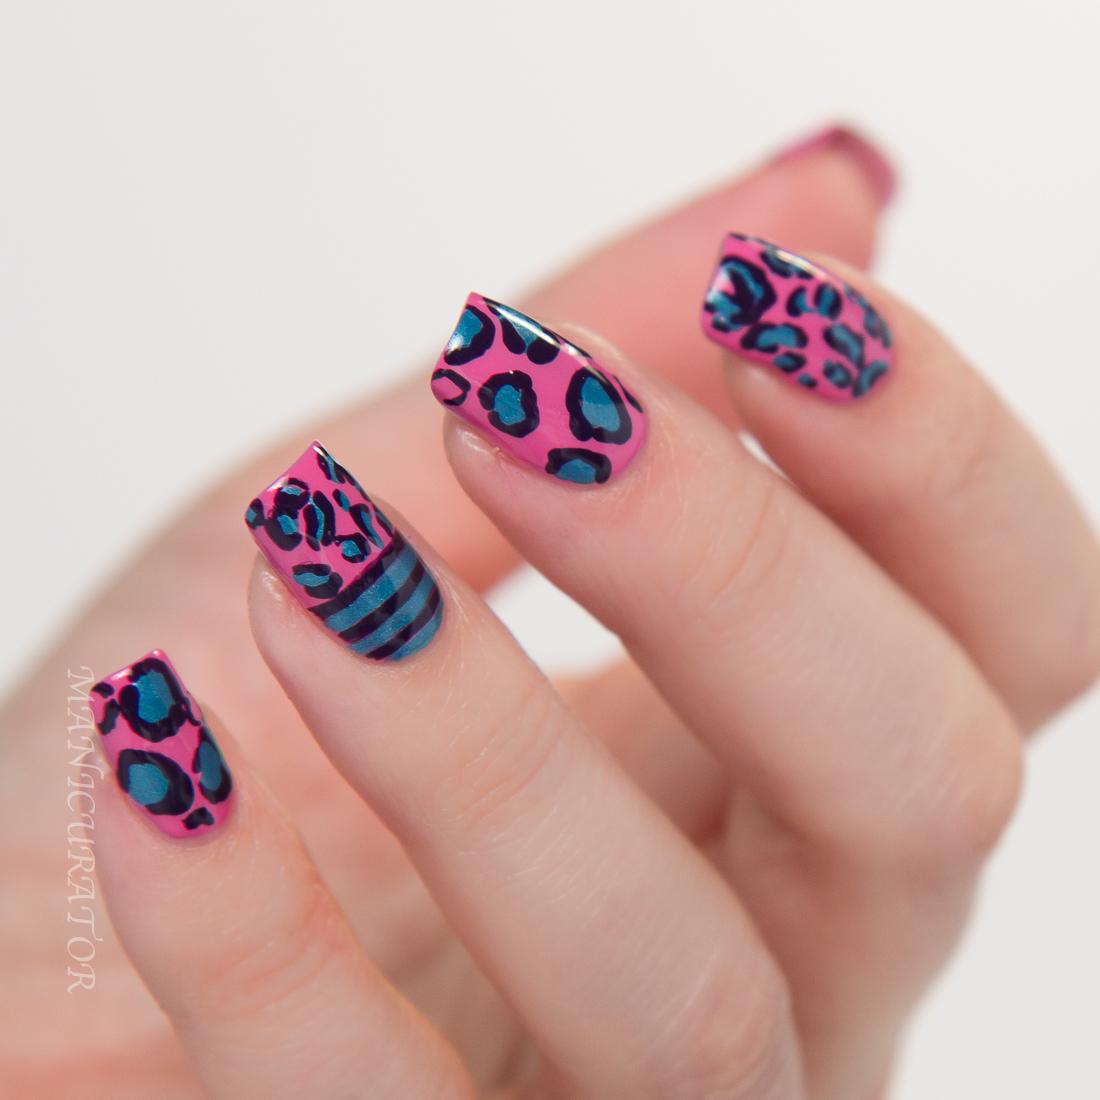 OPI-Suzi-Swede-Tooth-Al-Frisco-Grape-Affair-leopard-nail-art